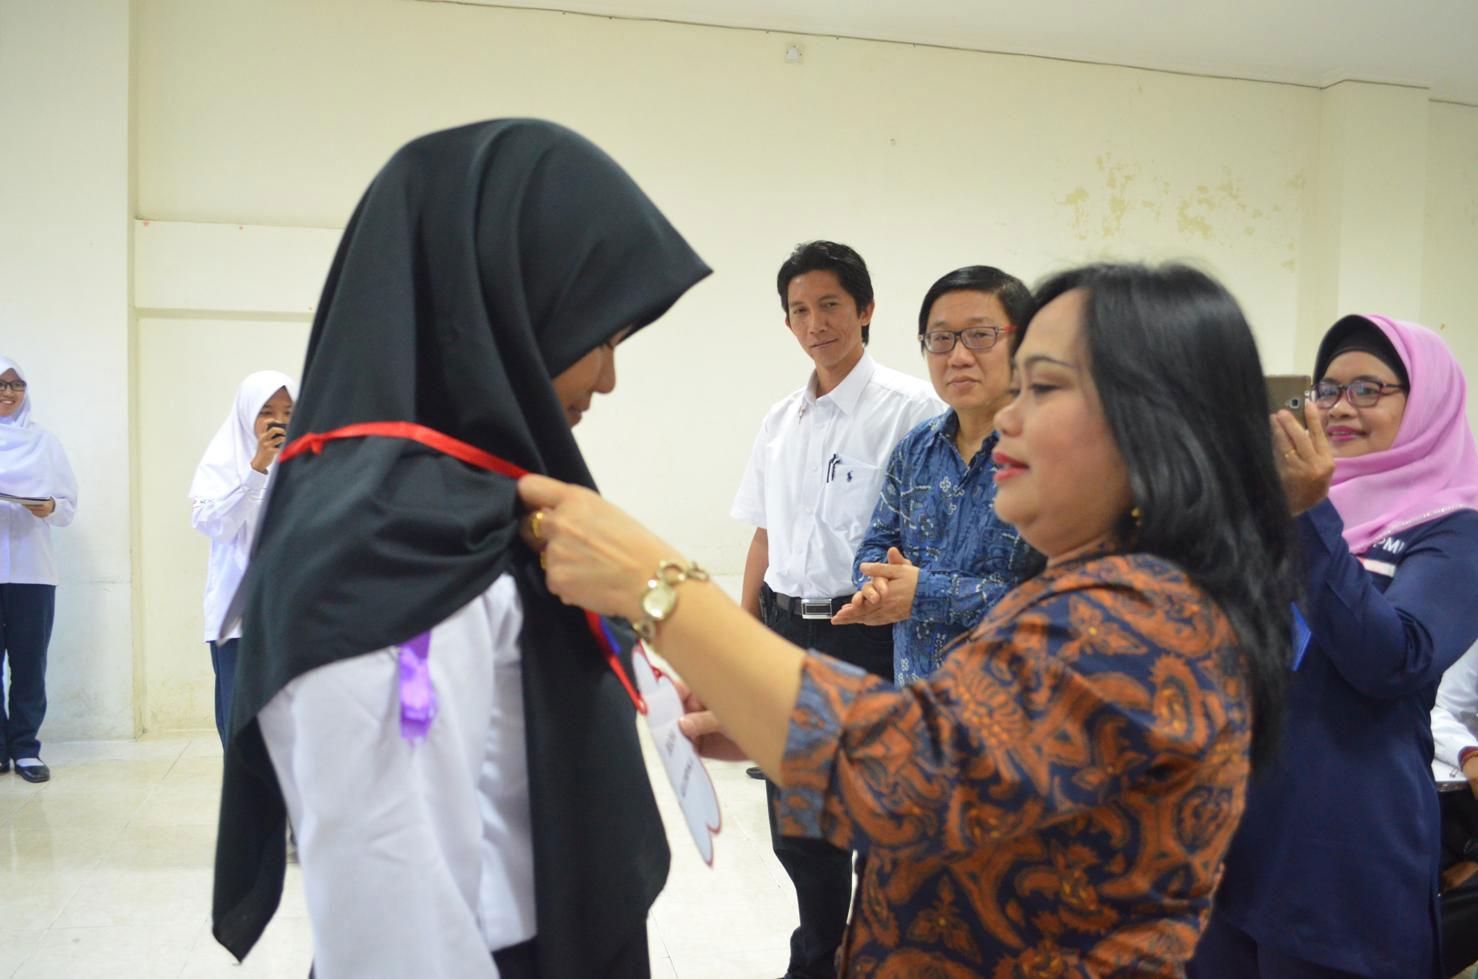 Dekan FKM Hanifa Maher Denny mengalungkan tanda peserta kepada perwakilan KSR PMI sebagai tanda dimulainya kegiatan Pendidikan dan Pelatihan 120 Jam Bagi Calon Anggota Korps Sukarela (KSR) PMI Unit FKM UNDIP, Rabu (1/02) di Kampus FKM Undip Tembalang.